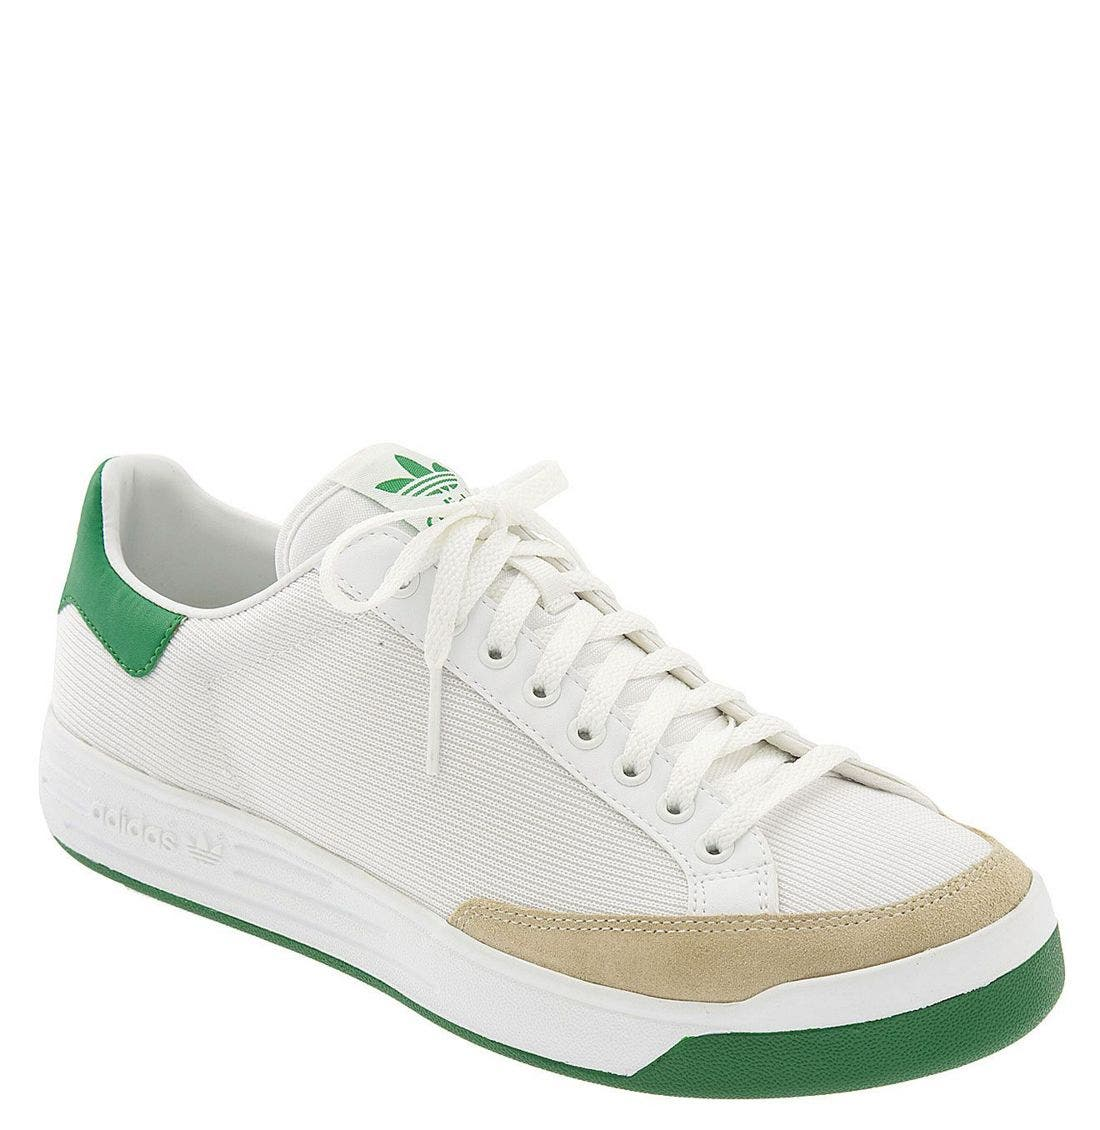 Alternate Image 1 Selected - adidas 'Rod Laver' Sneaker (Men)